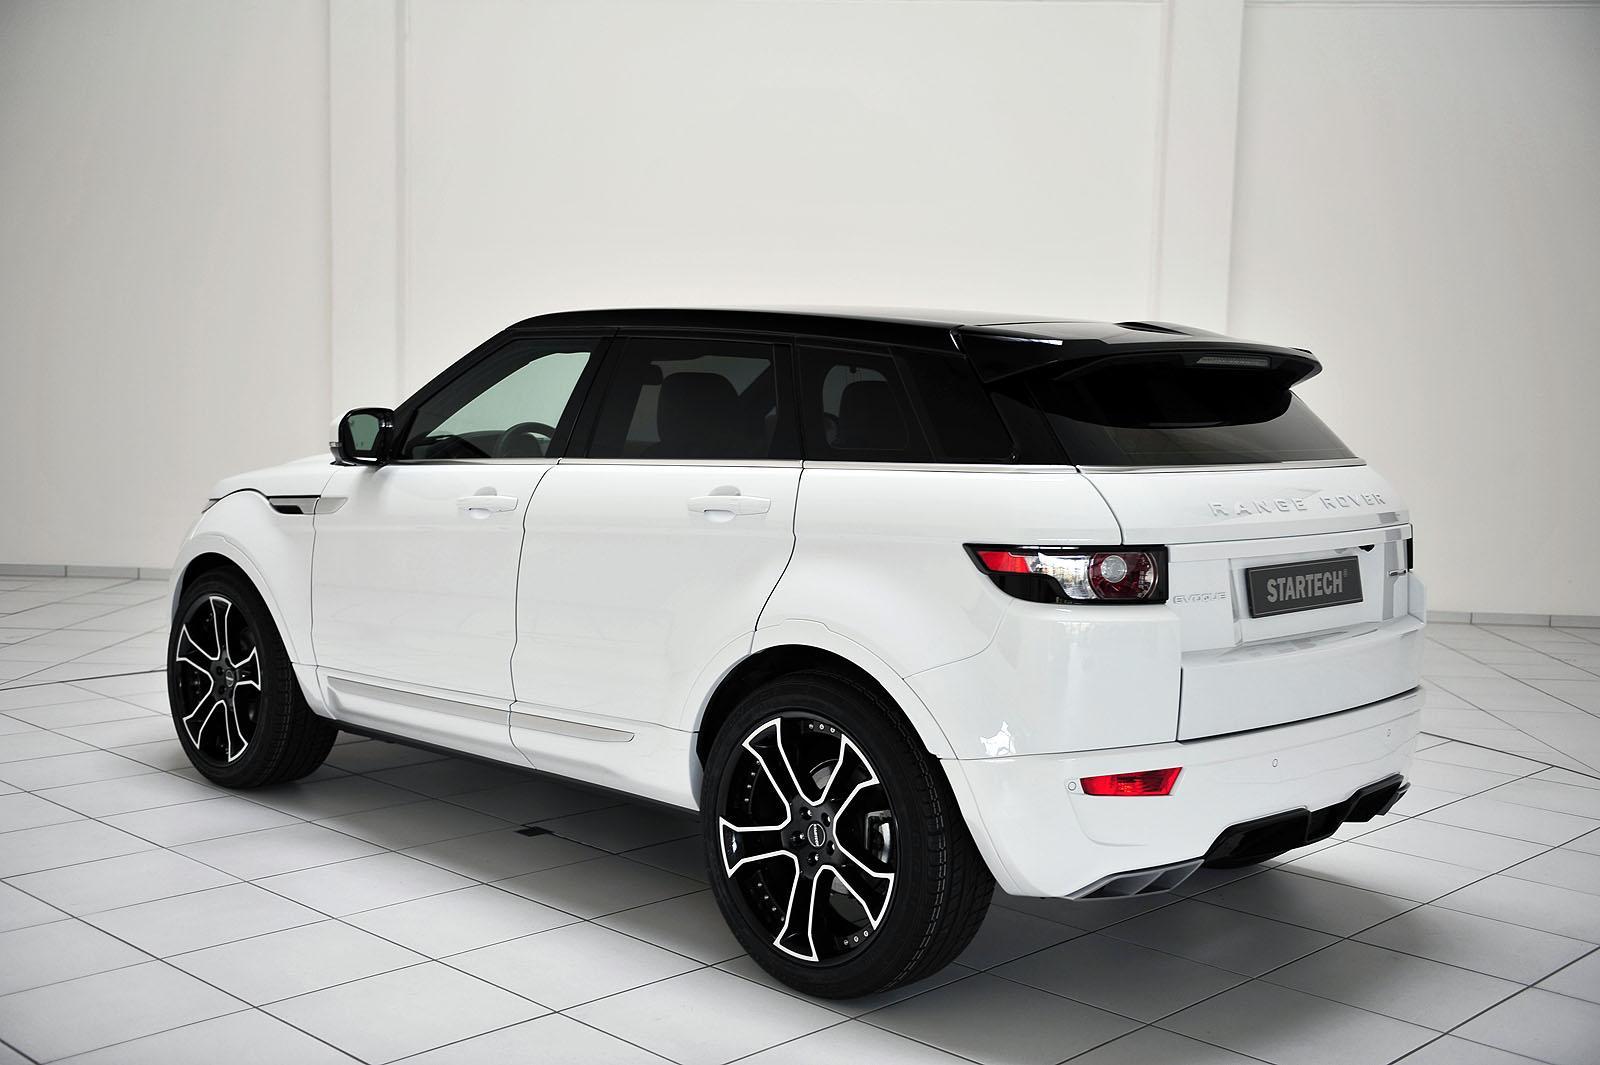 Startech Range Rover Evoque - Picture 60491